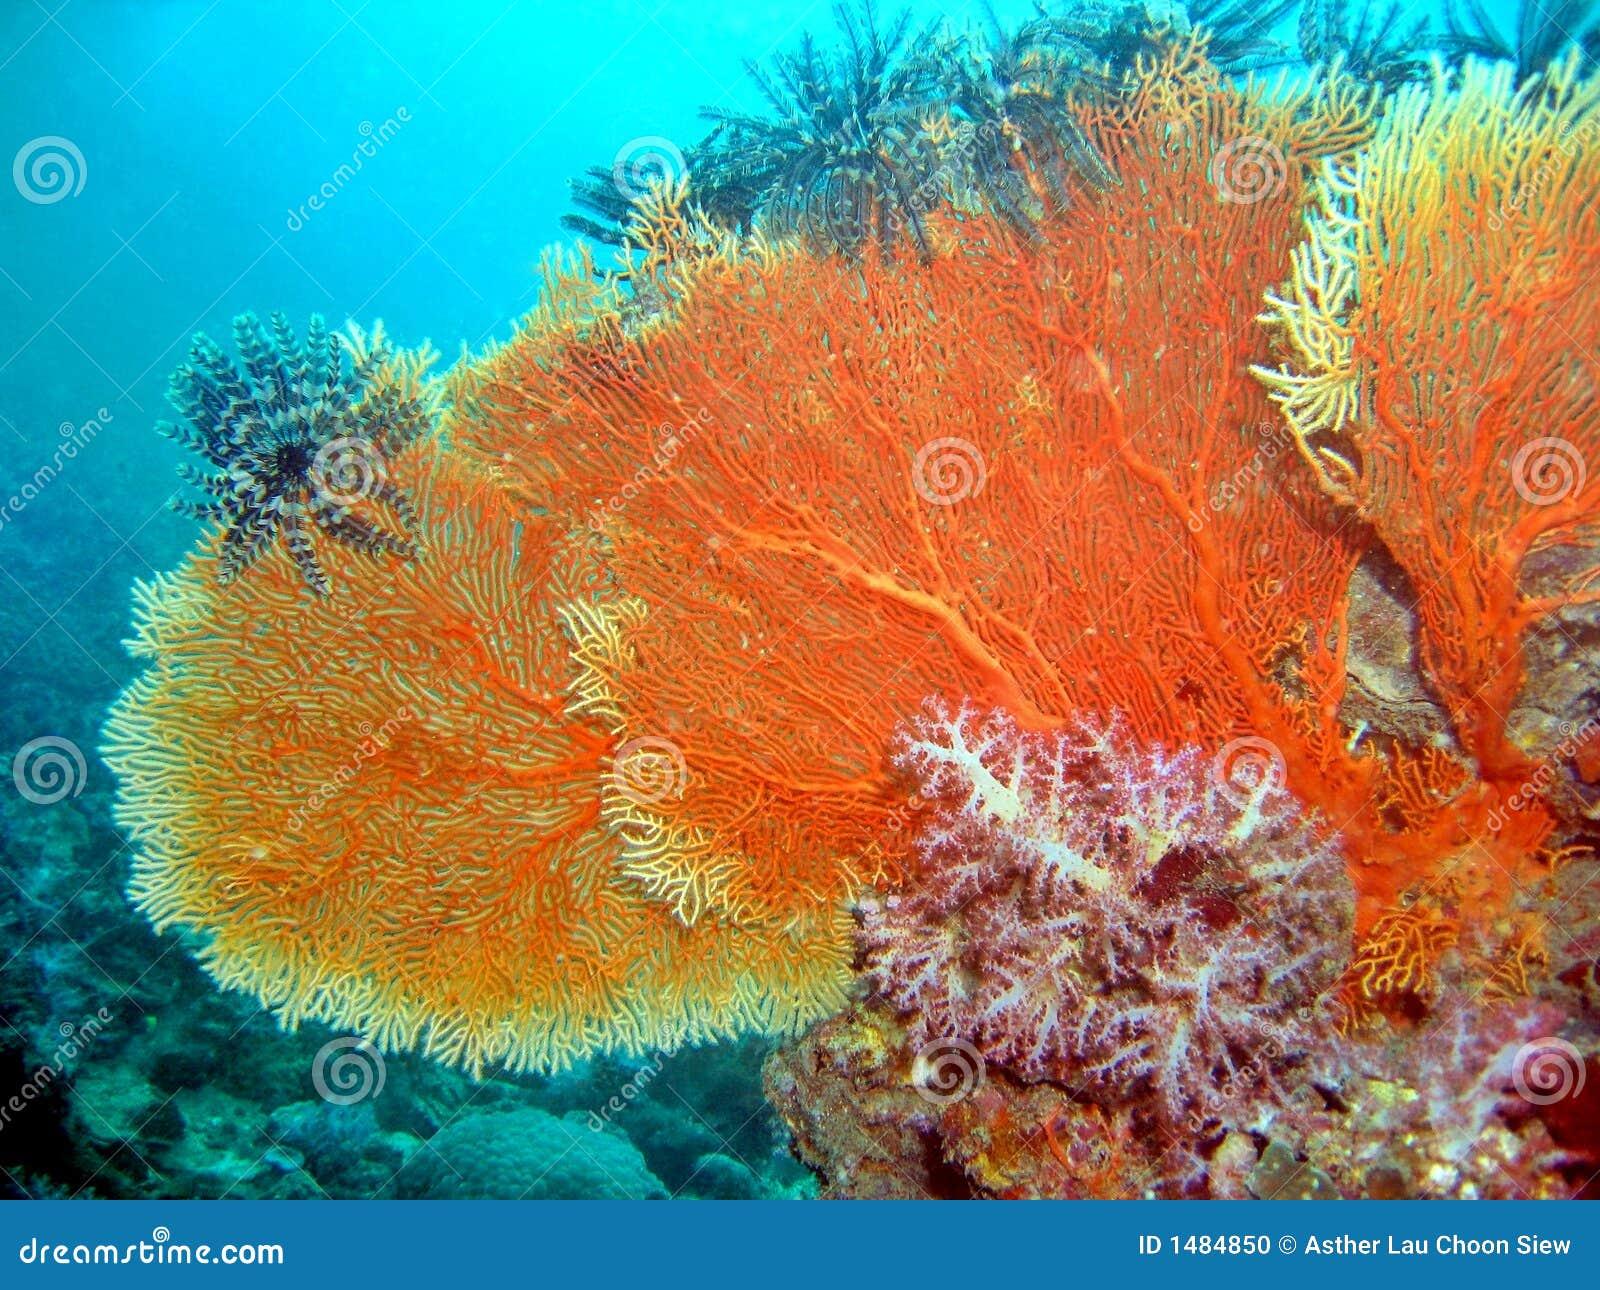 Sea fan coral stock photo image of aquatic seascape 1484850 sea fan coral publicscrutiny Images